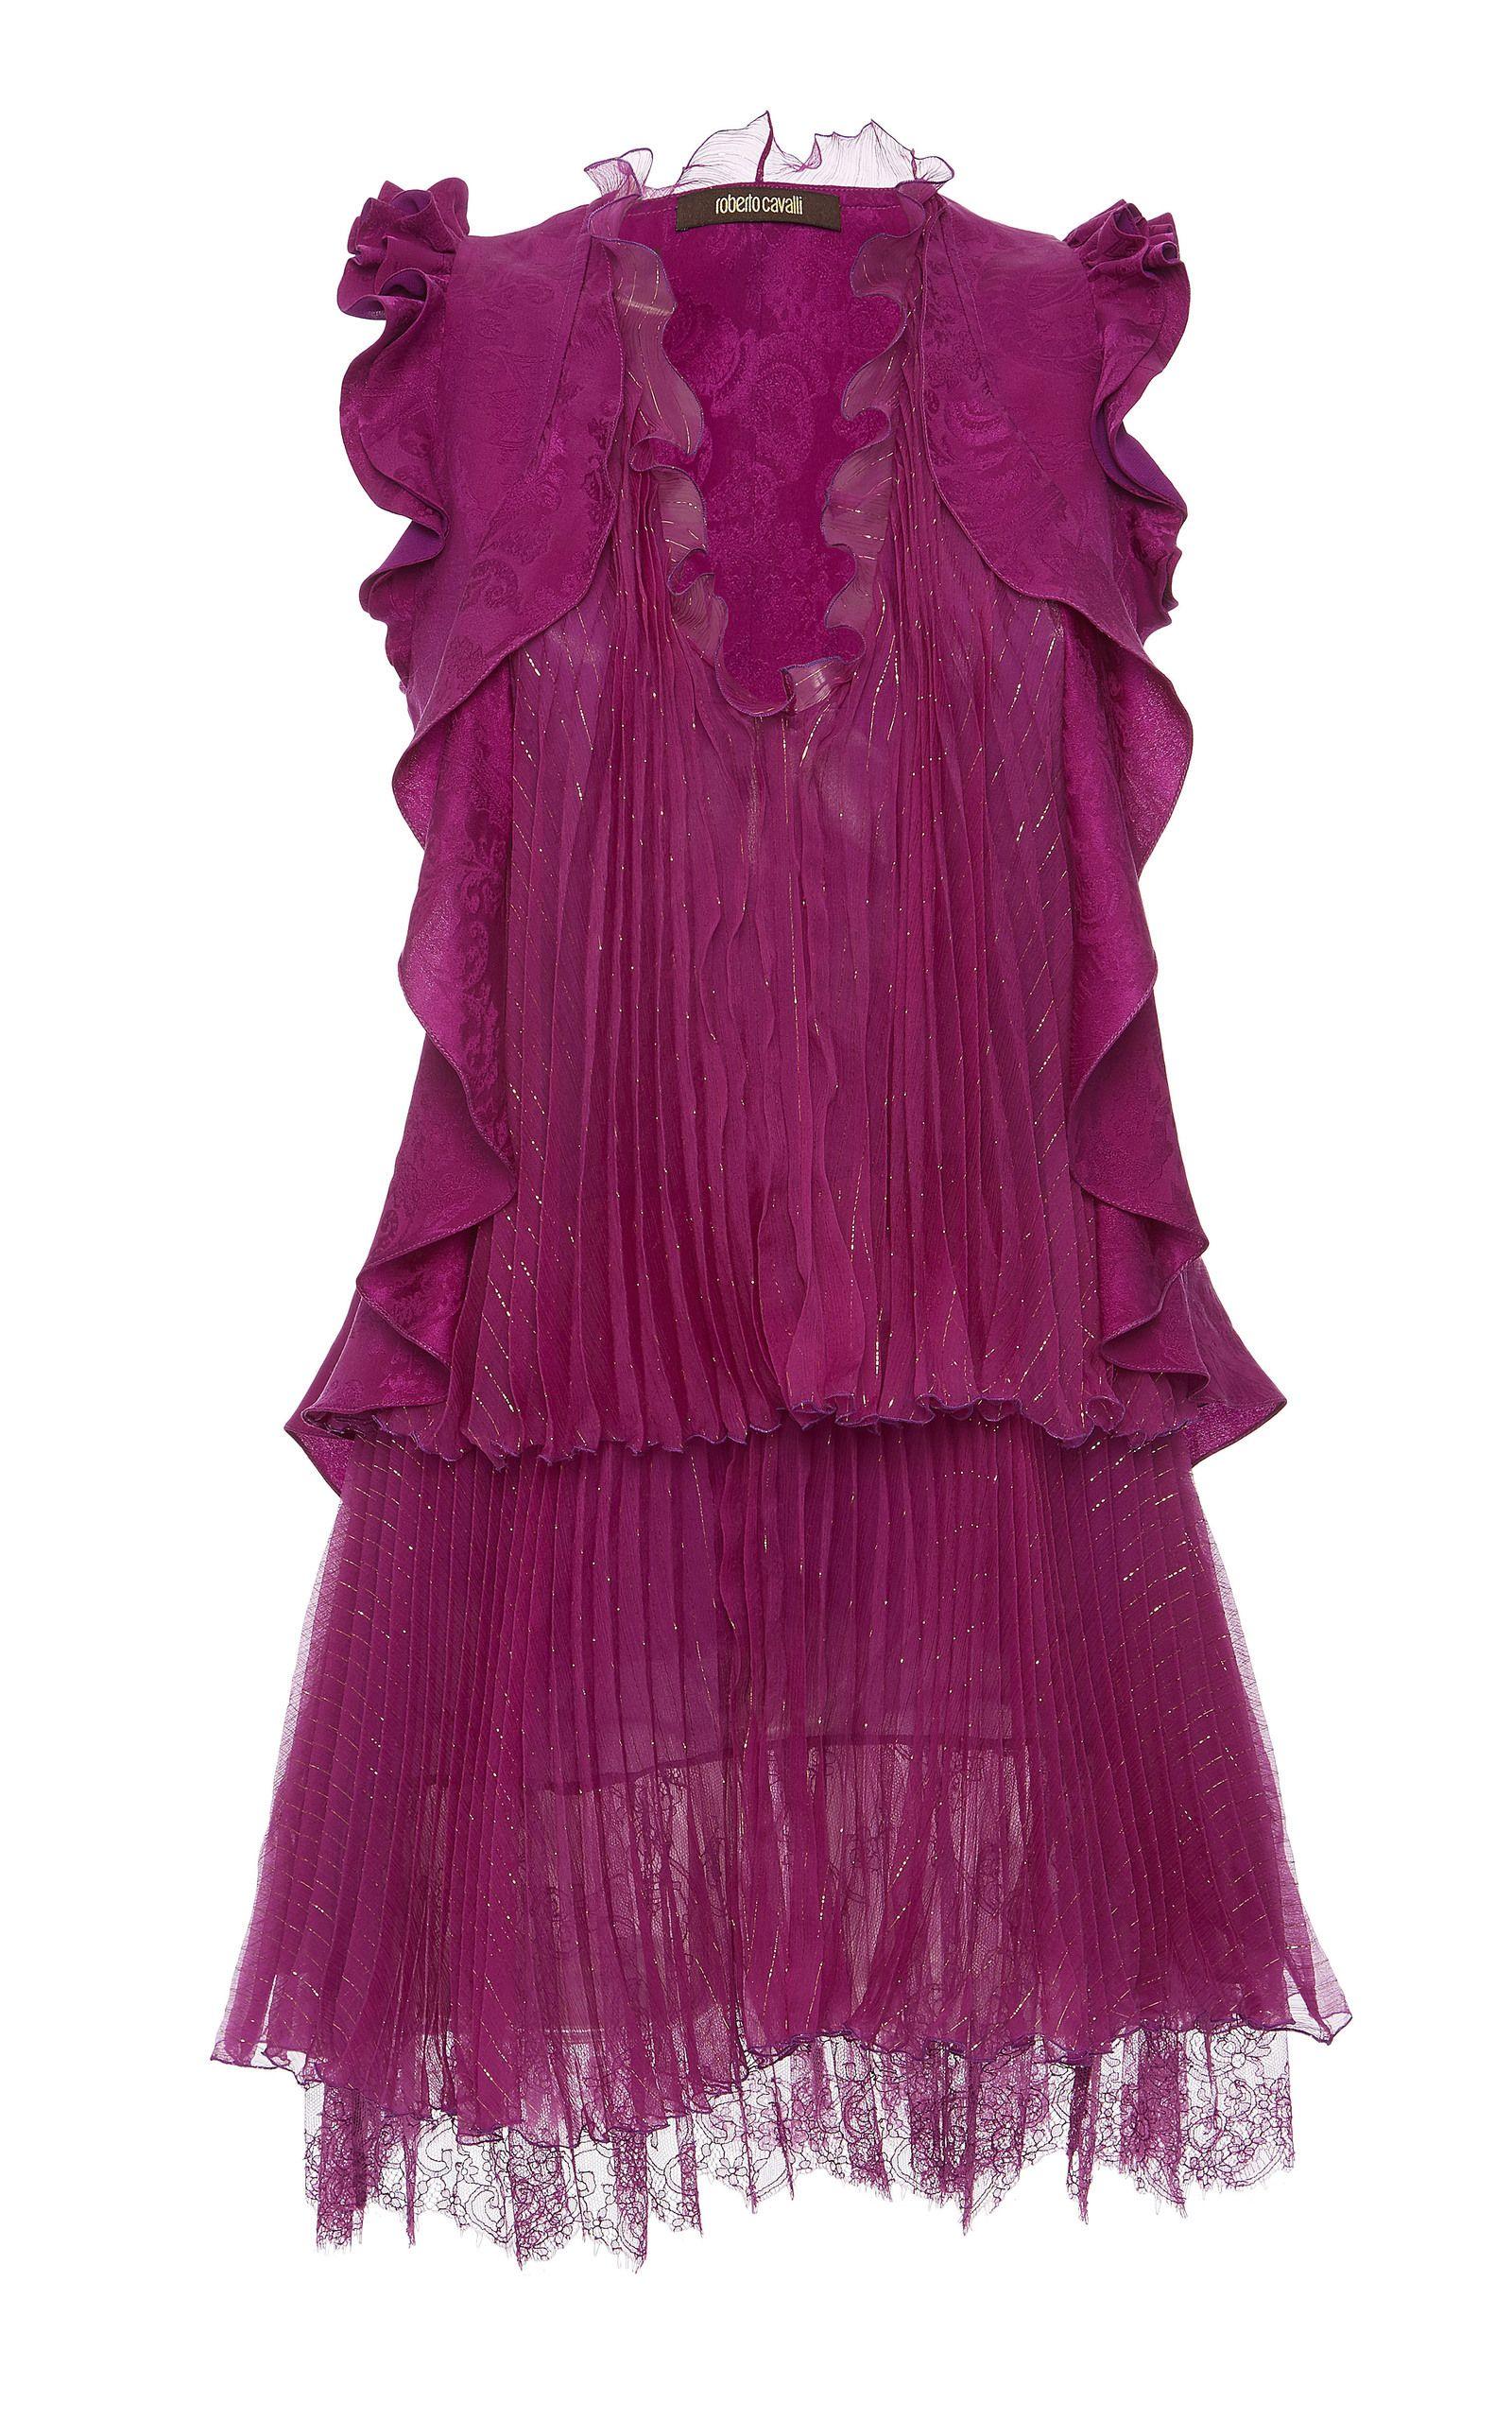 Ruffled Sleeveless Day Dress by ROBERTO CAVALLI Now Available on Moda Operandi